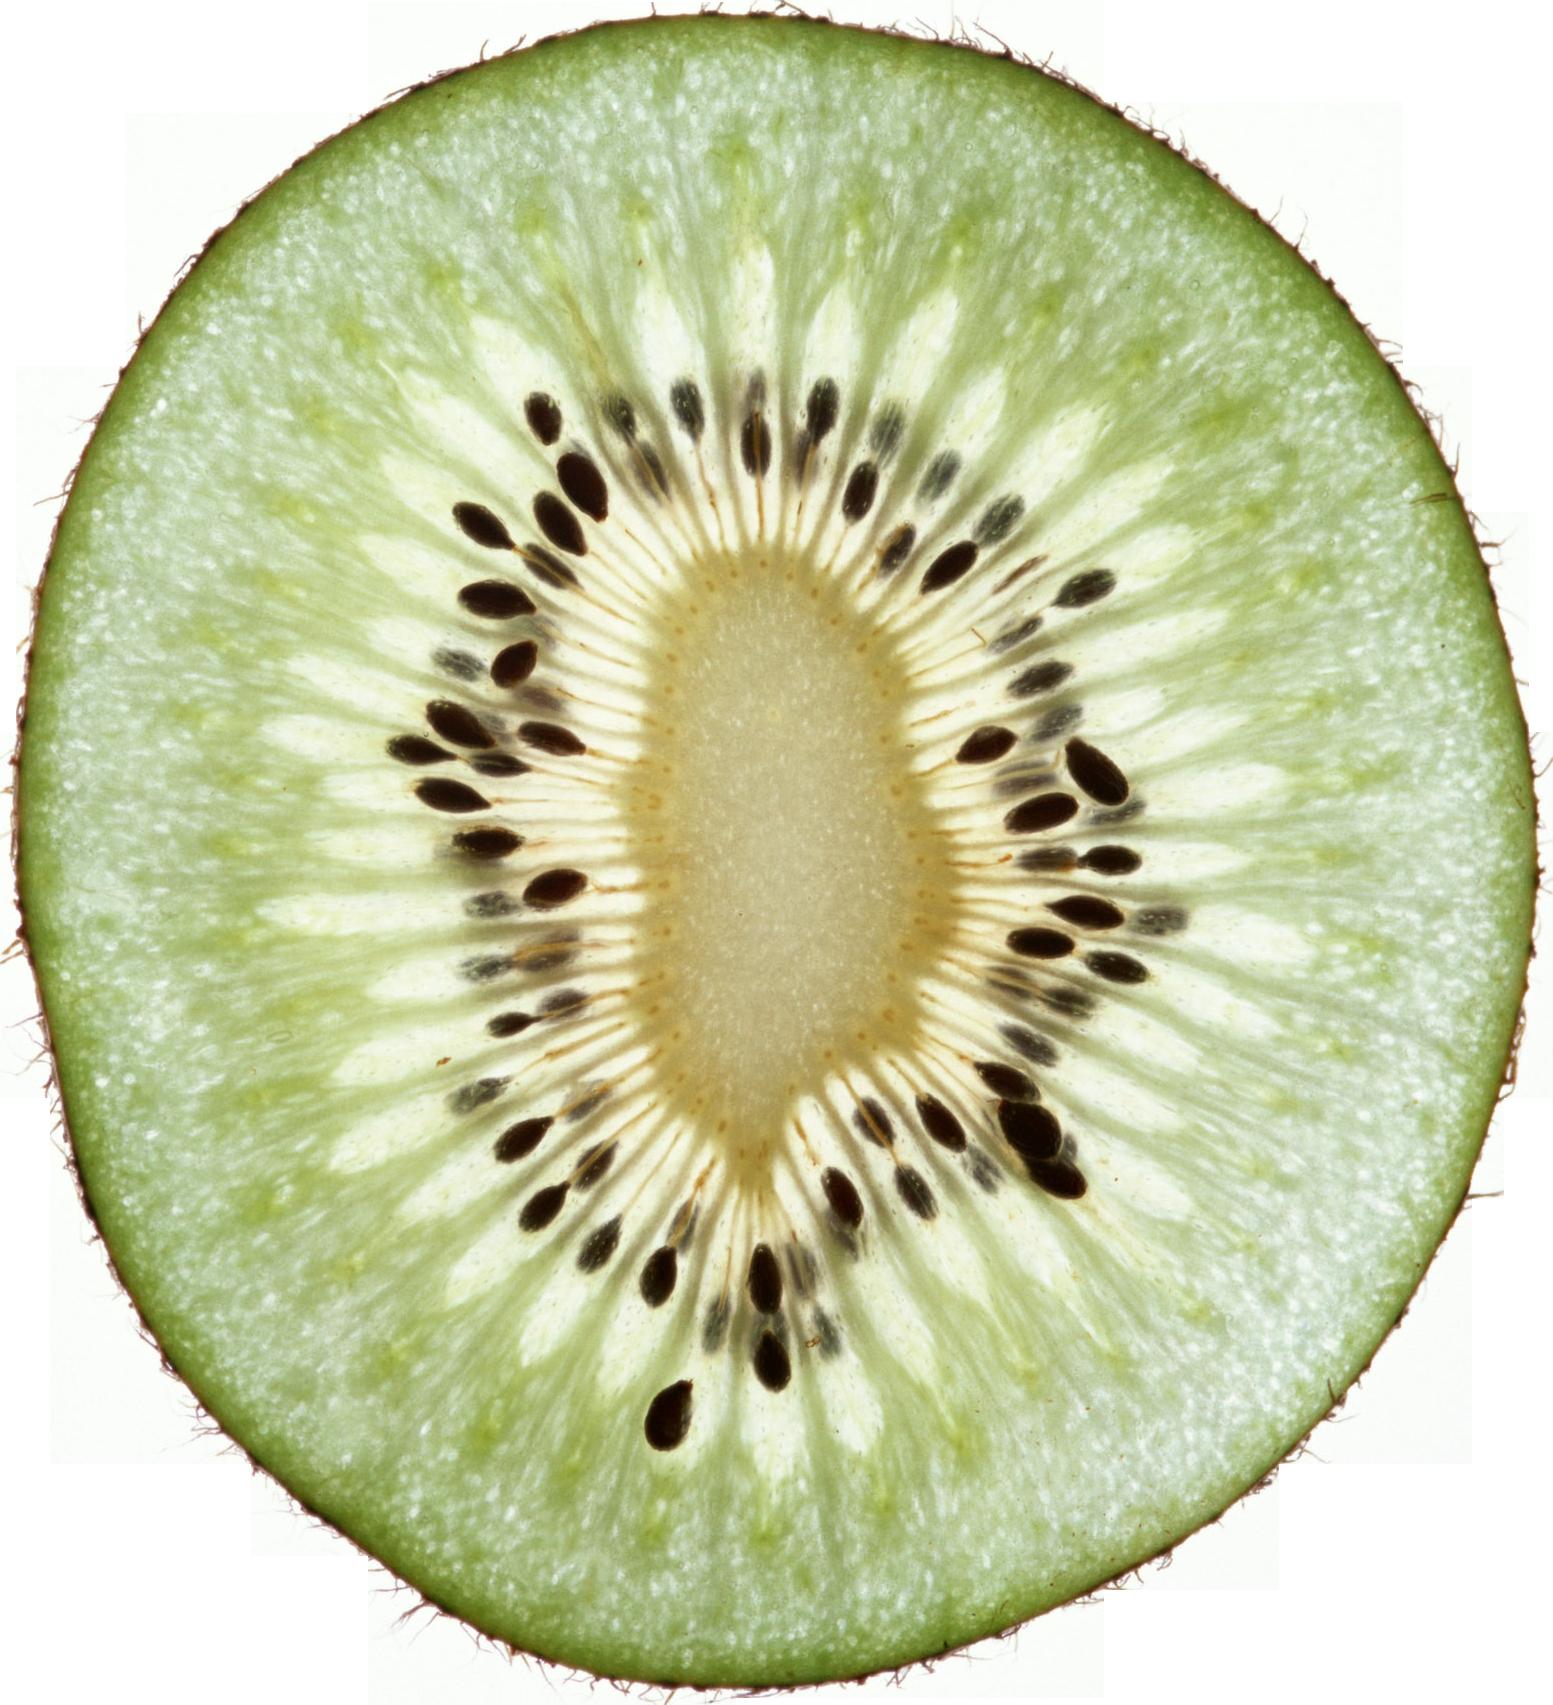 Kiwi Halved PNG Image